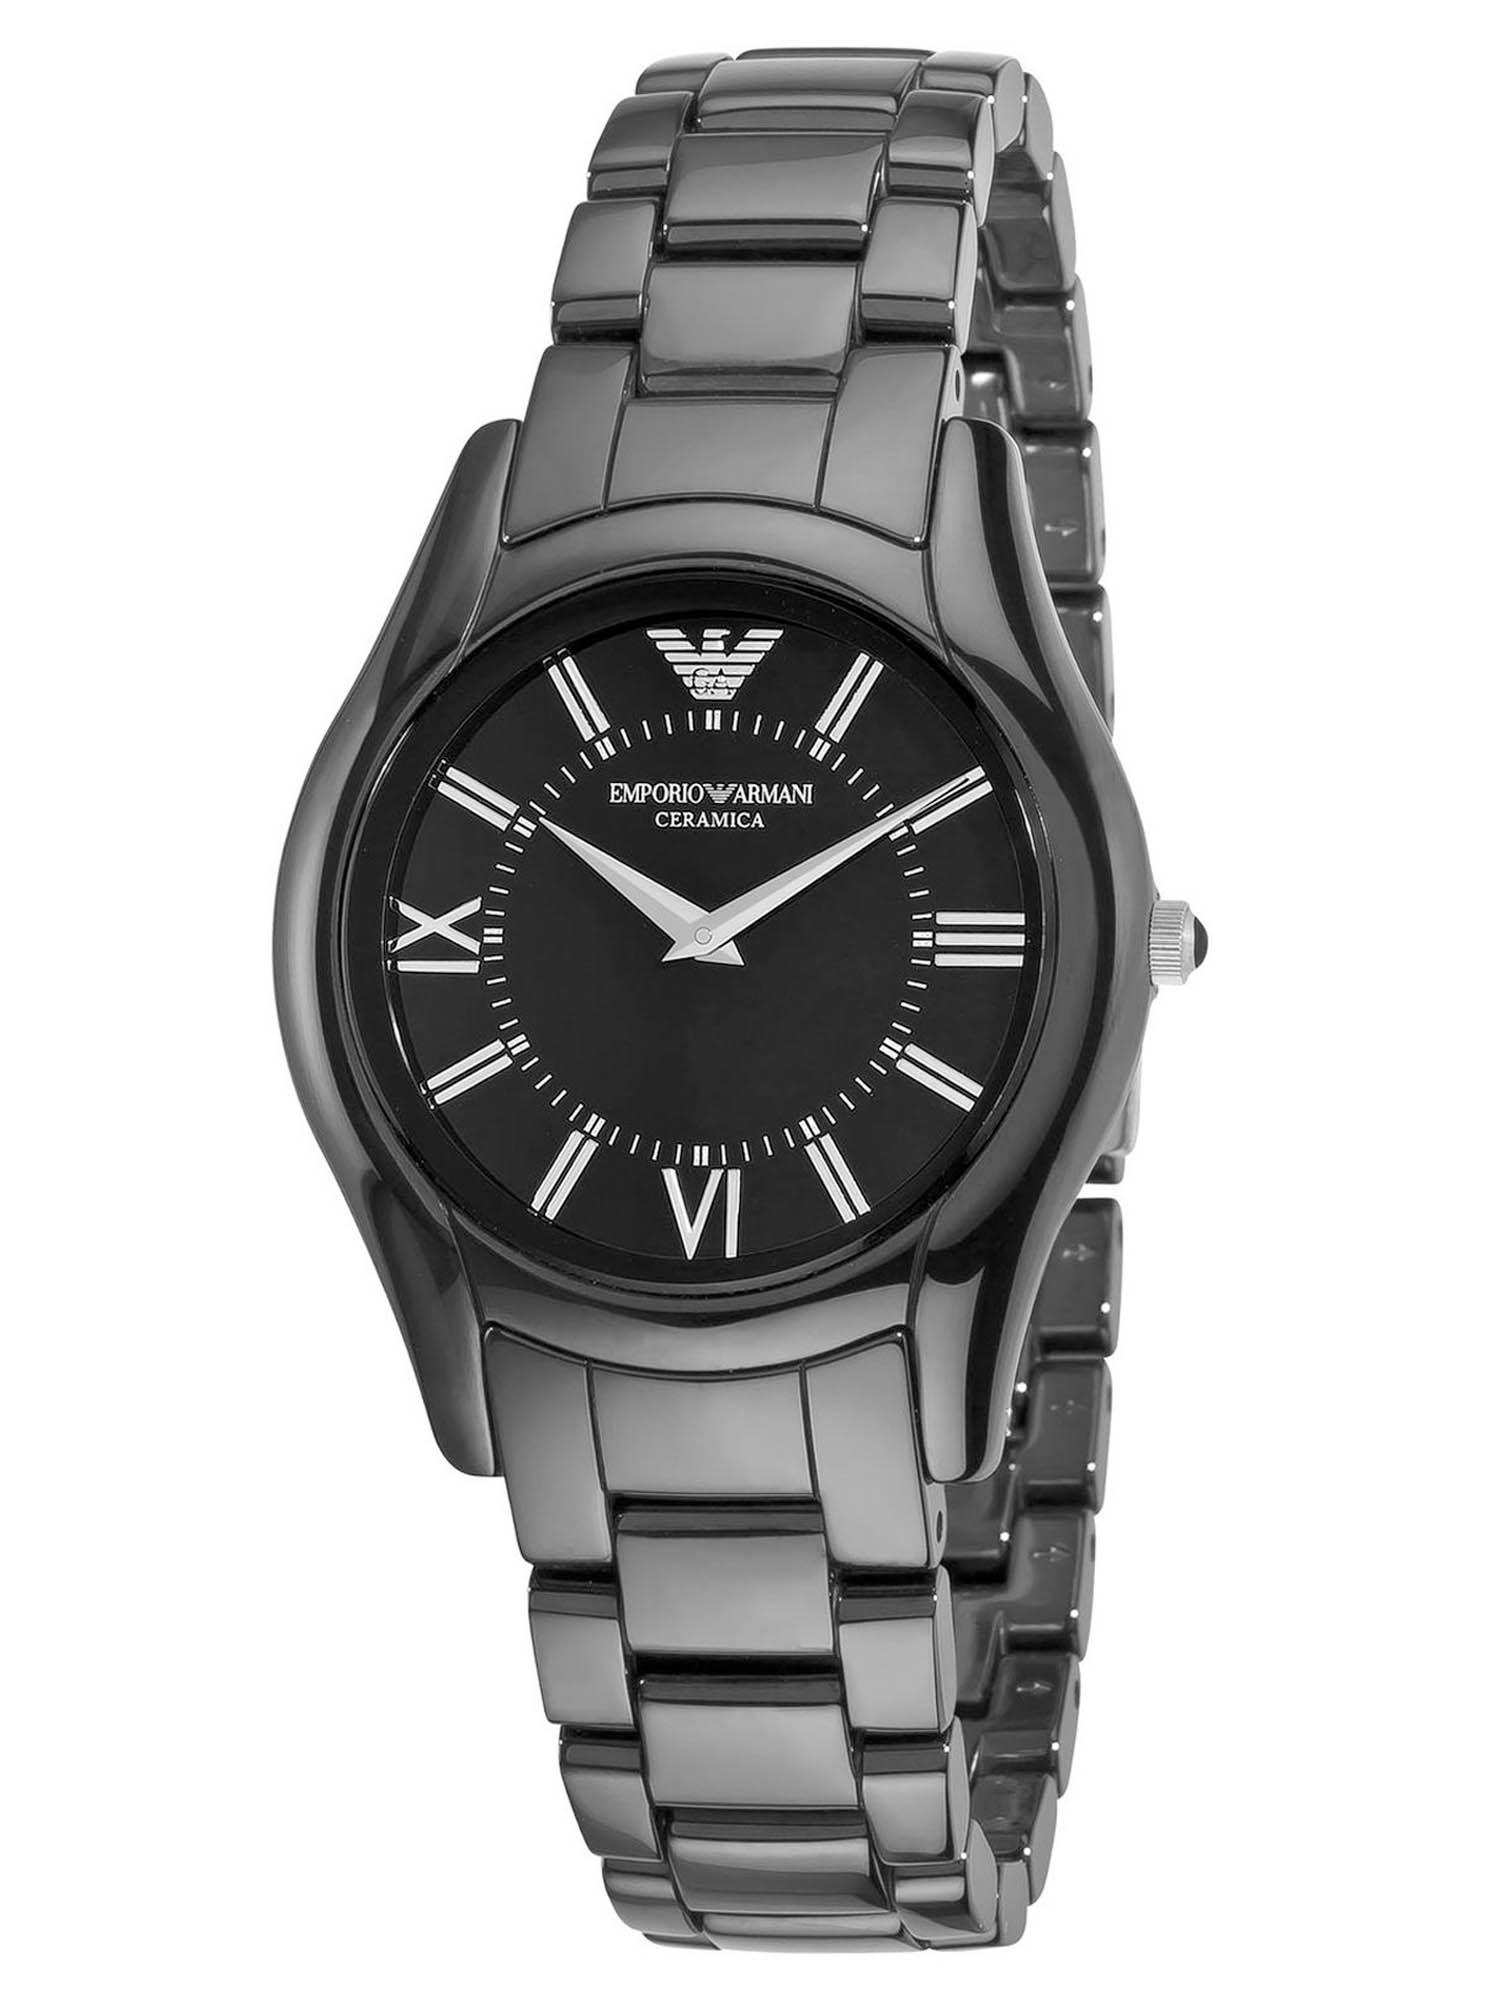 Emporio Armani Women's AR1441 Ceramic Slim Black Dial Watch